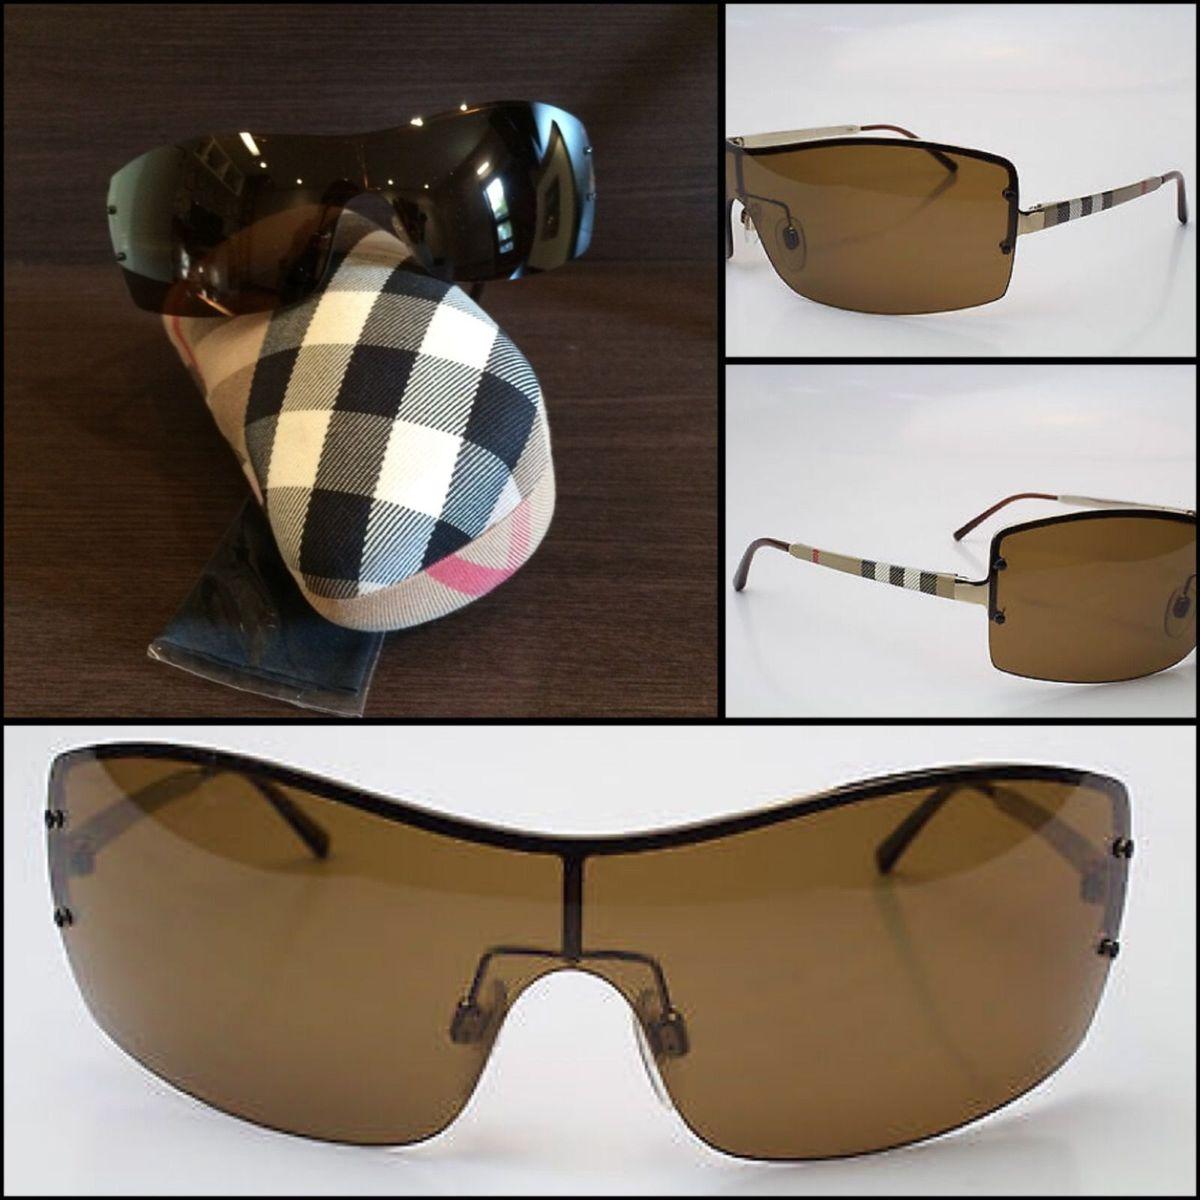 54a646557b8b0 óculos de sol estilo máscara - óculos burberry.  Czm6ly9wag90b3muzw5qb2vplmnvbs5ici9wcm9kdwn0cy85ota3ndgvzwjimznjngzhmzlmotm1mgqynwy3owywmdljoweyowyuanbn